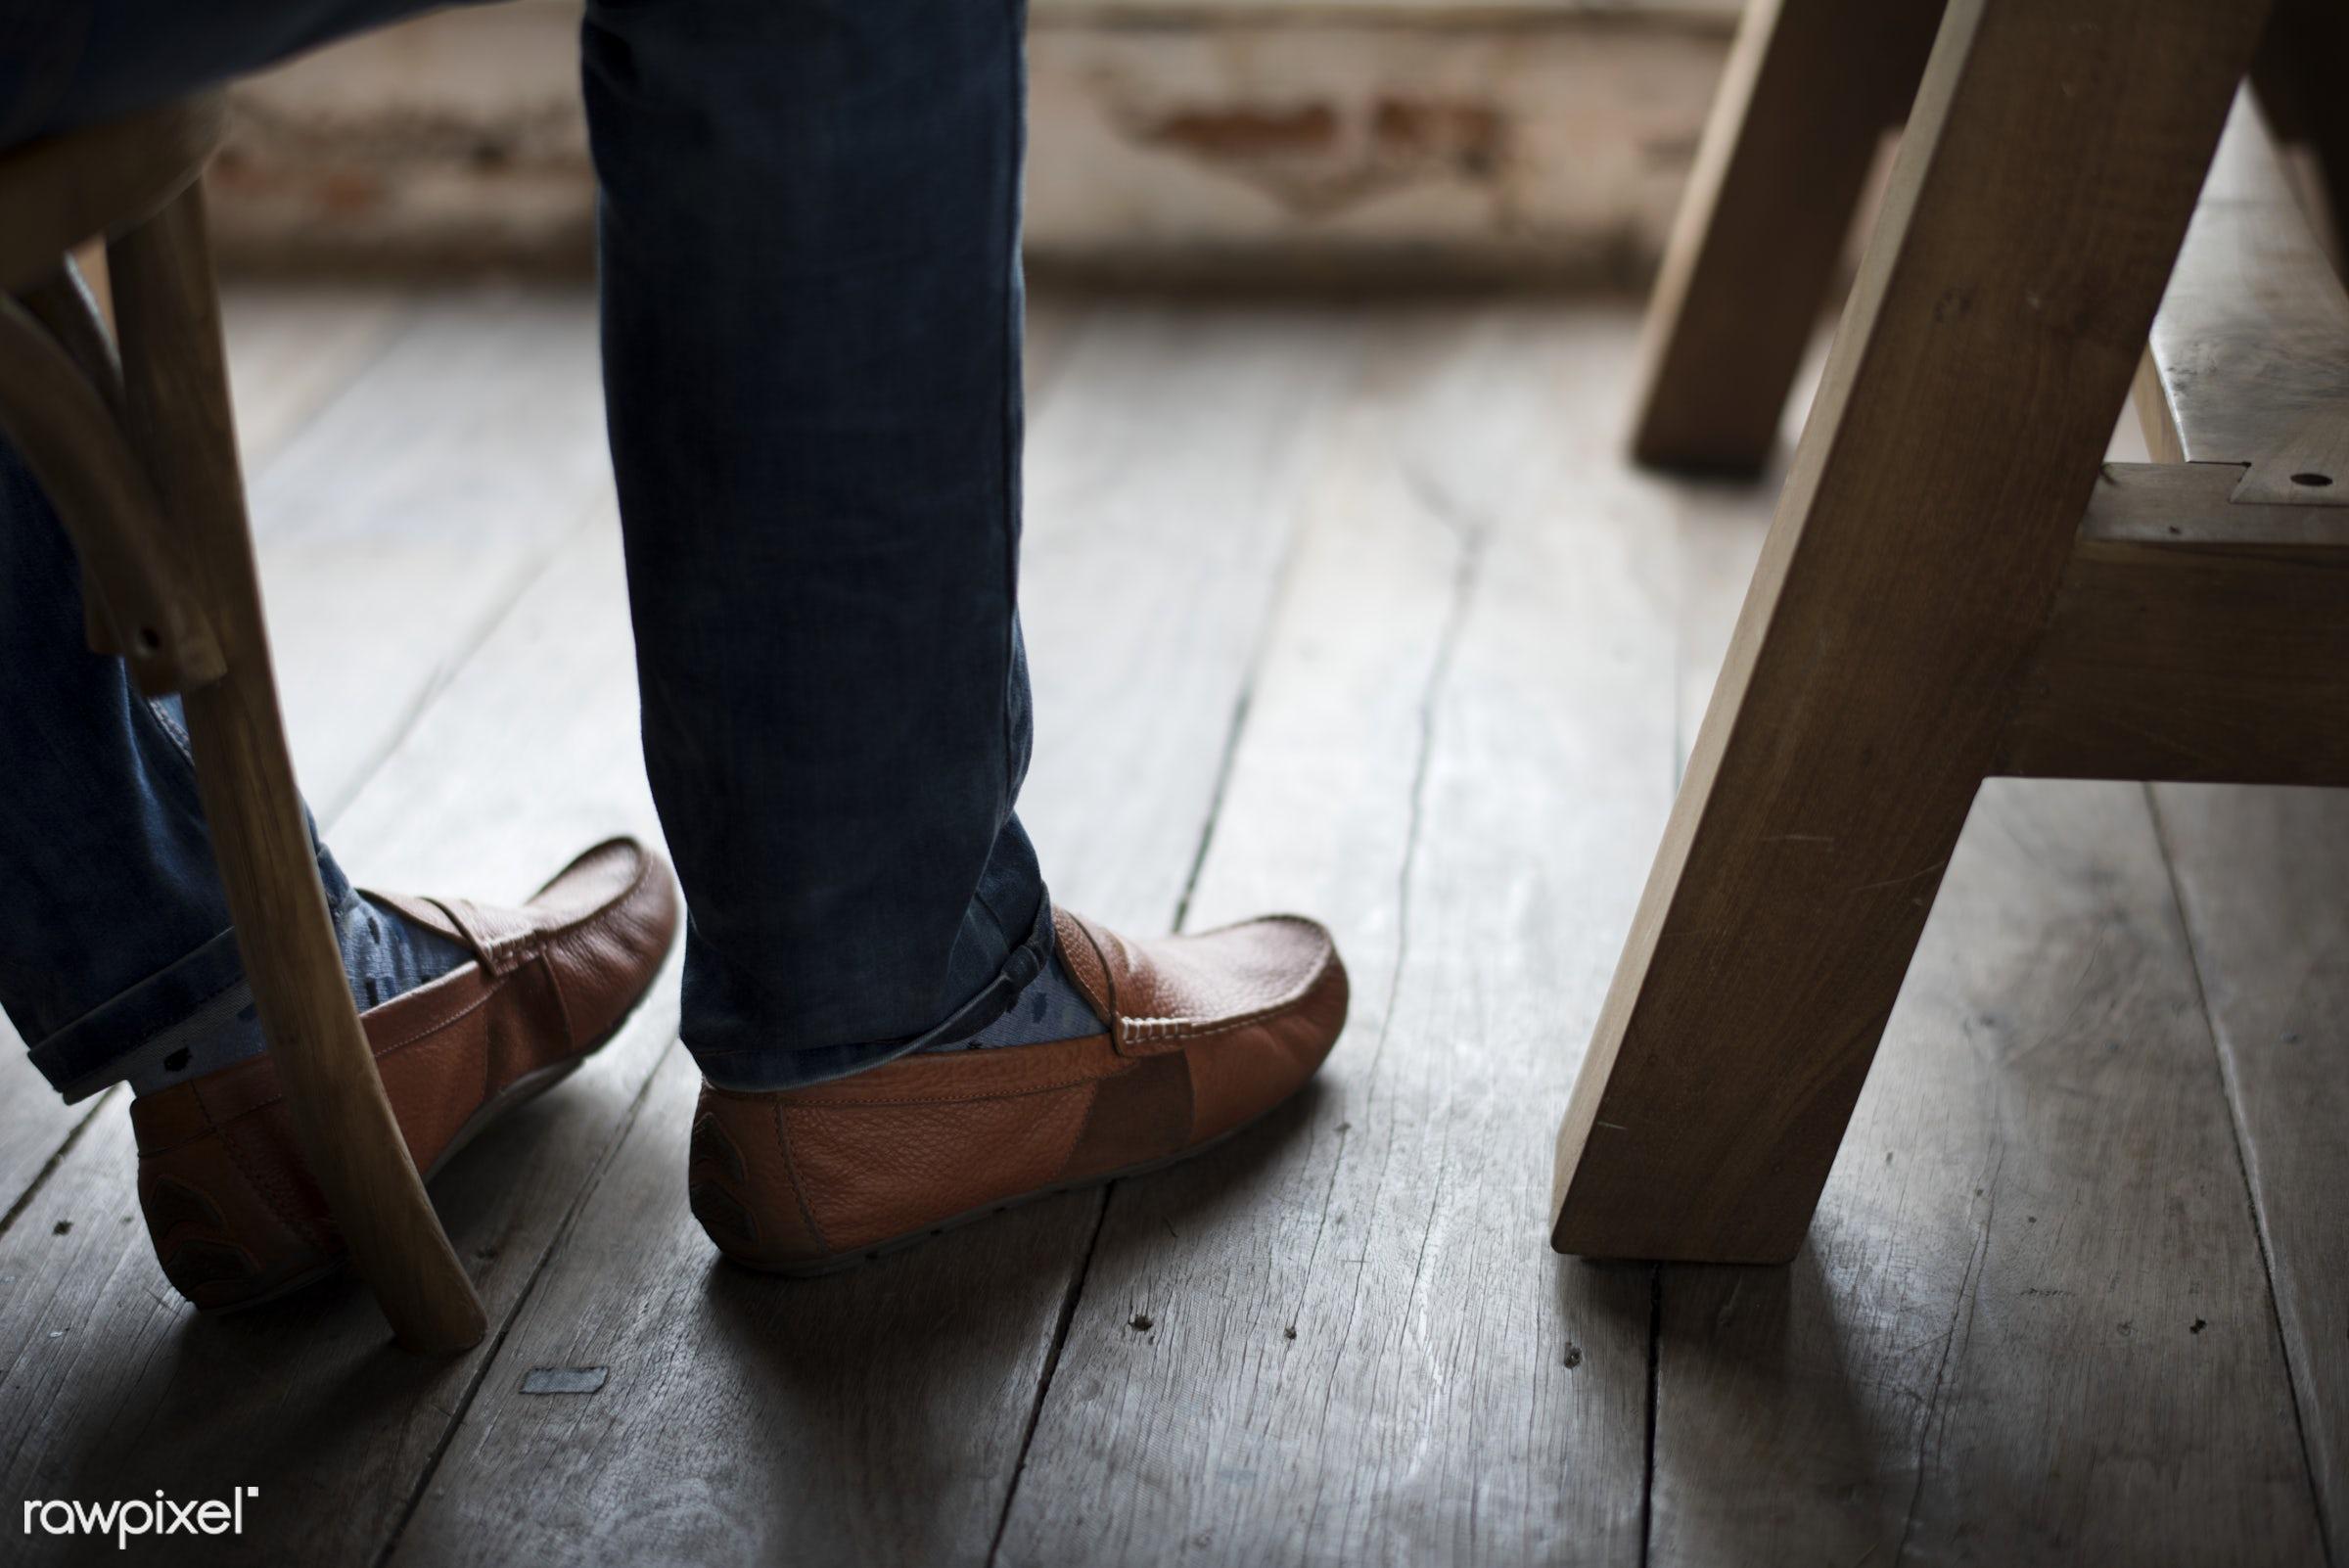 person, footwear, foot, clothing, wooden floor, socks, indoors, desk, people, life, lifestyle, casual, men, alone, man,...